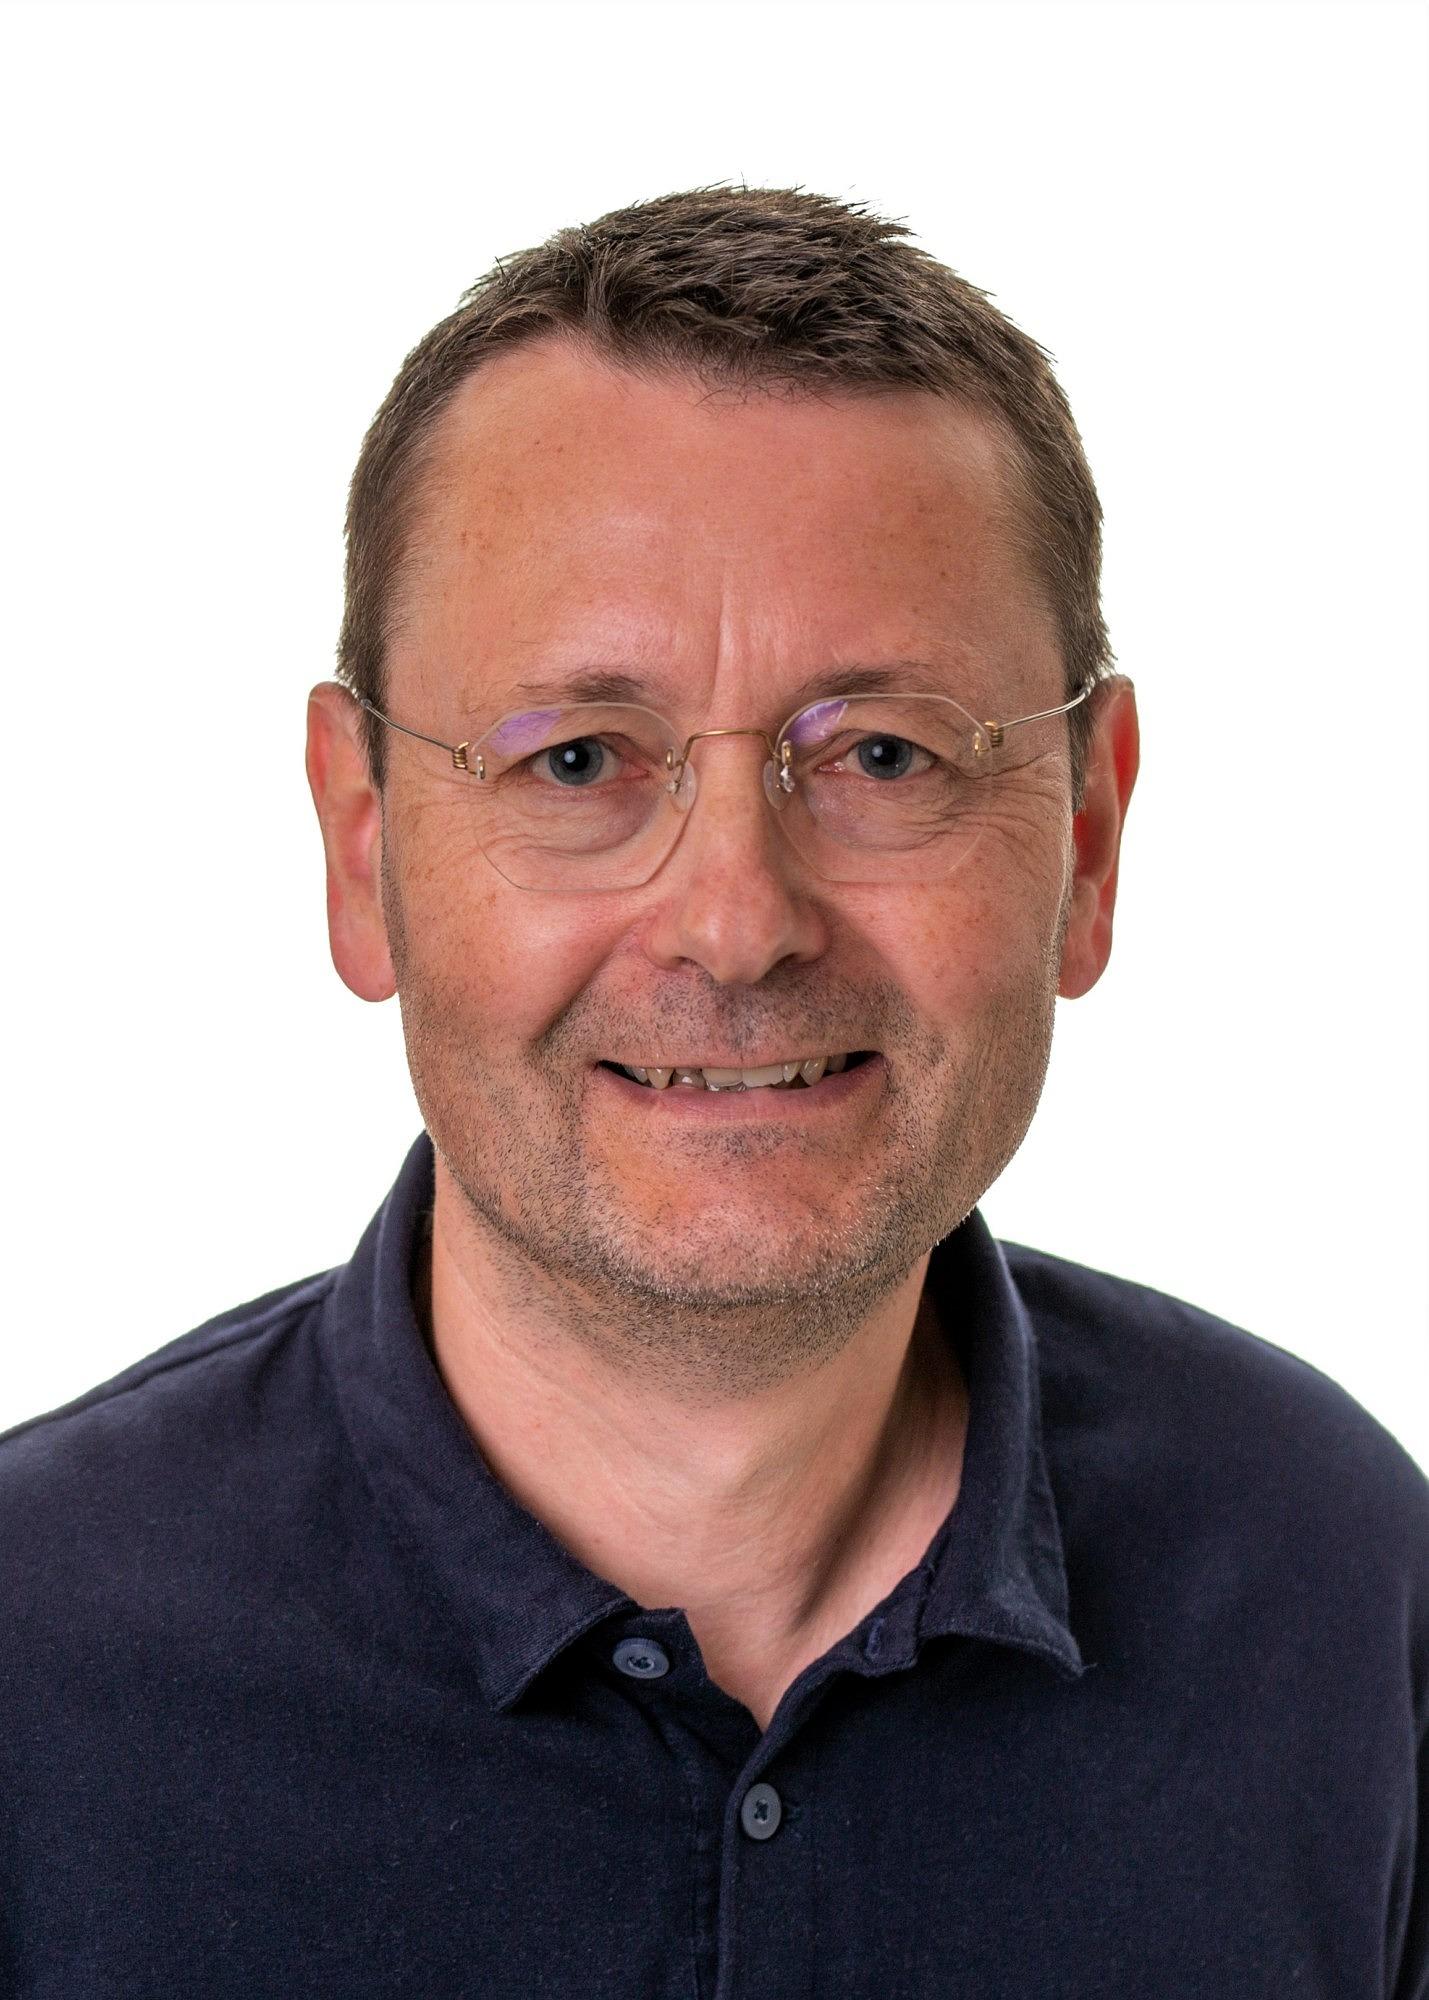 Johann Jäger